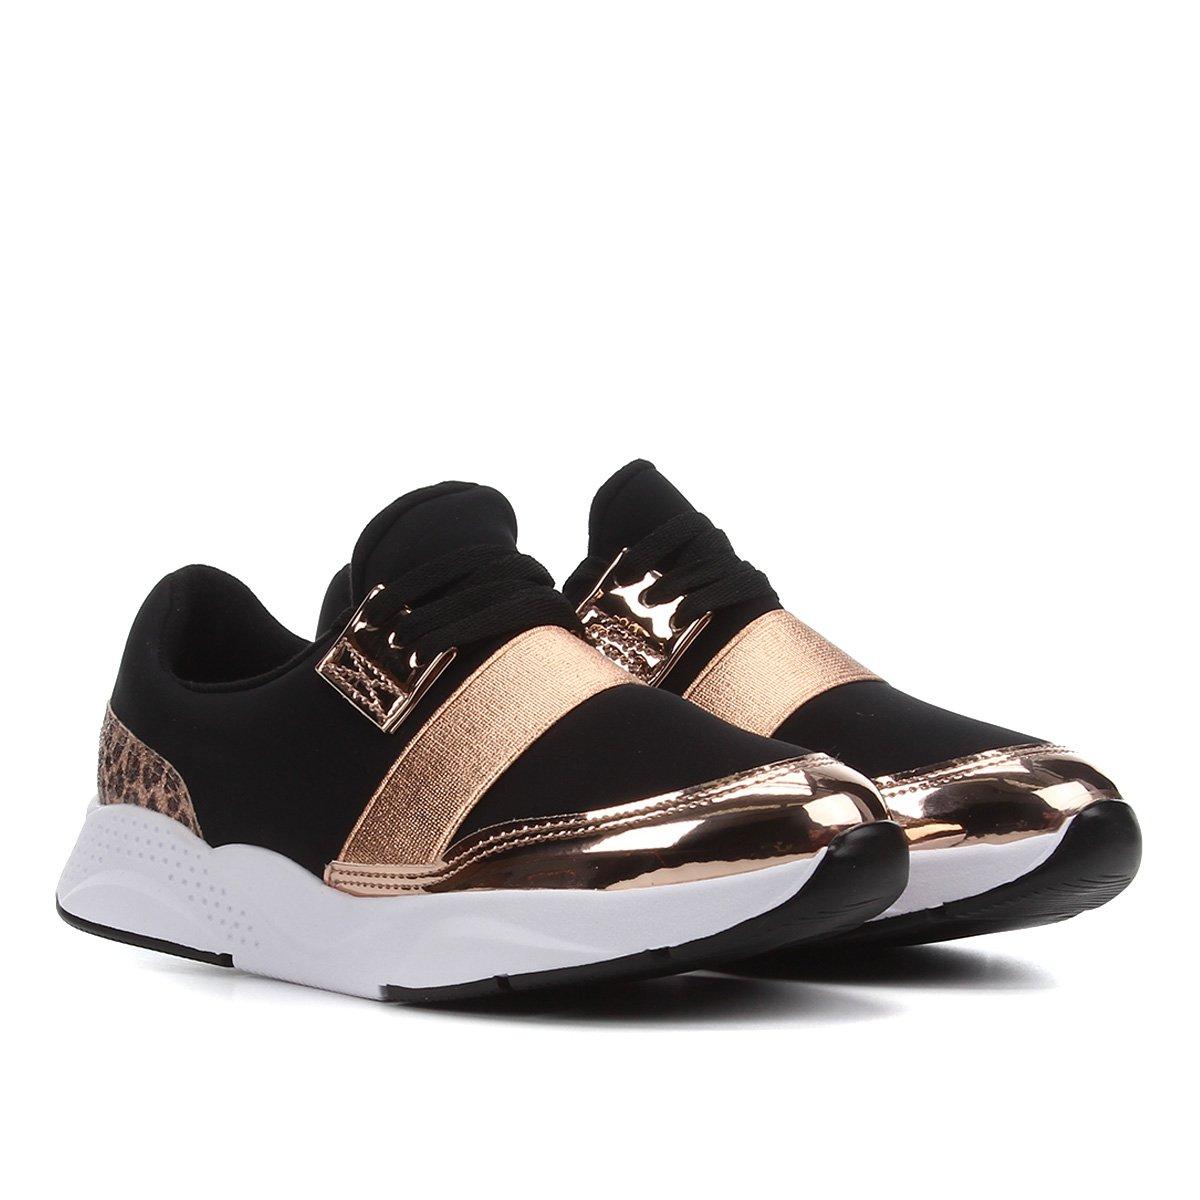 Sapato Infantil Molekinha Tira Metalizada Feminino